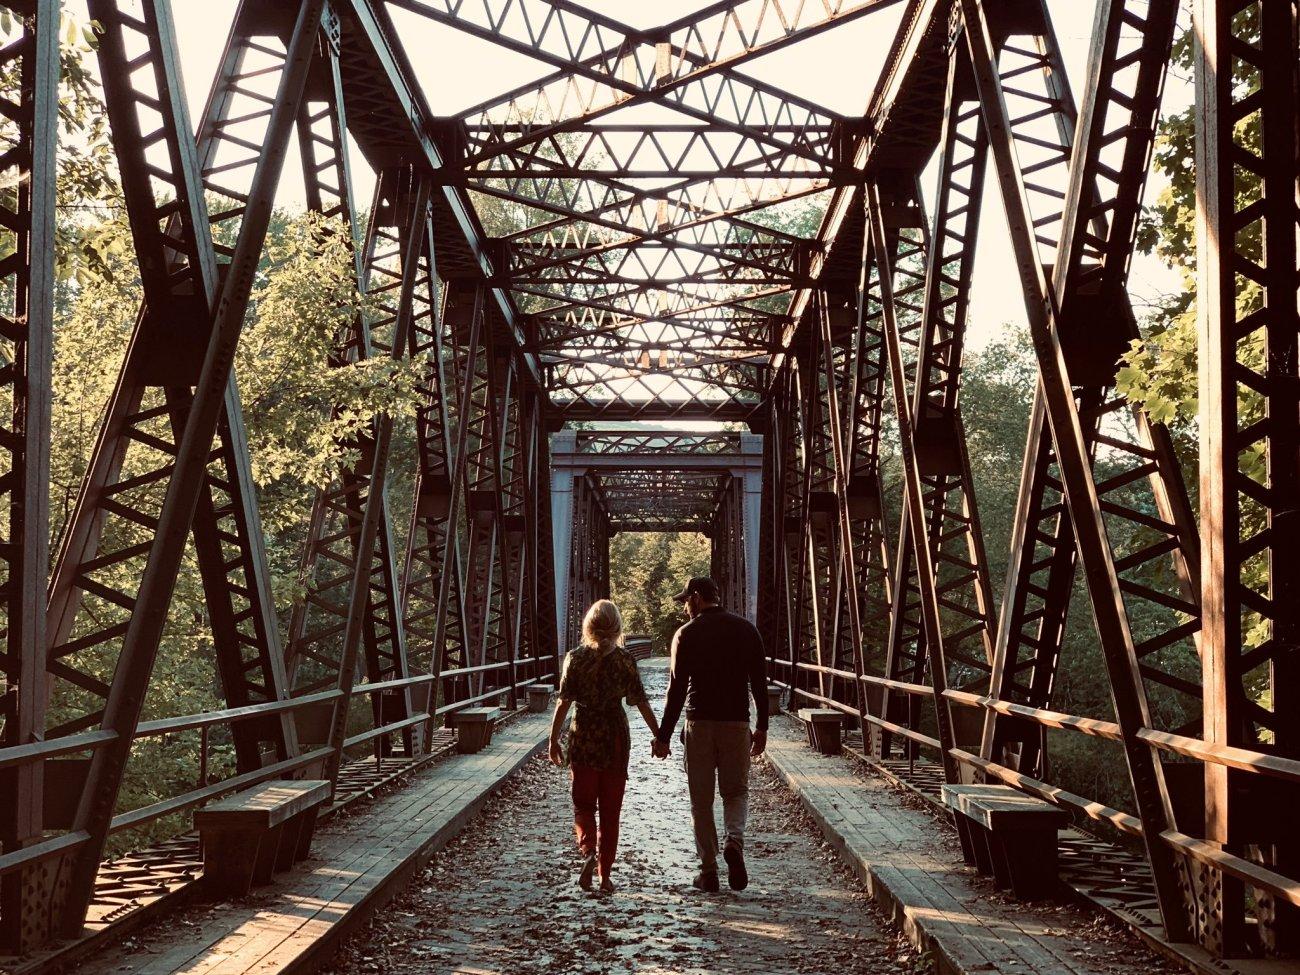 Emily Blunt y el director John Krasinski en el set de A Quiet Place Part II (2020). Imagen: John Krasinski Twitter (@johnkrasinski).